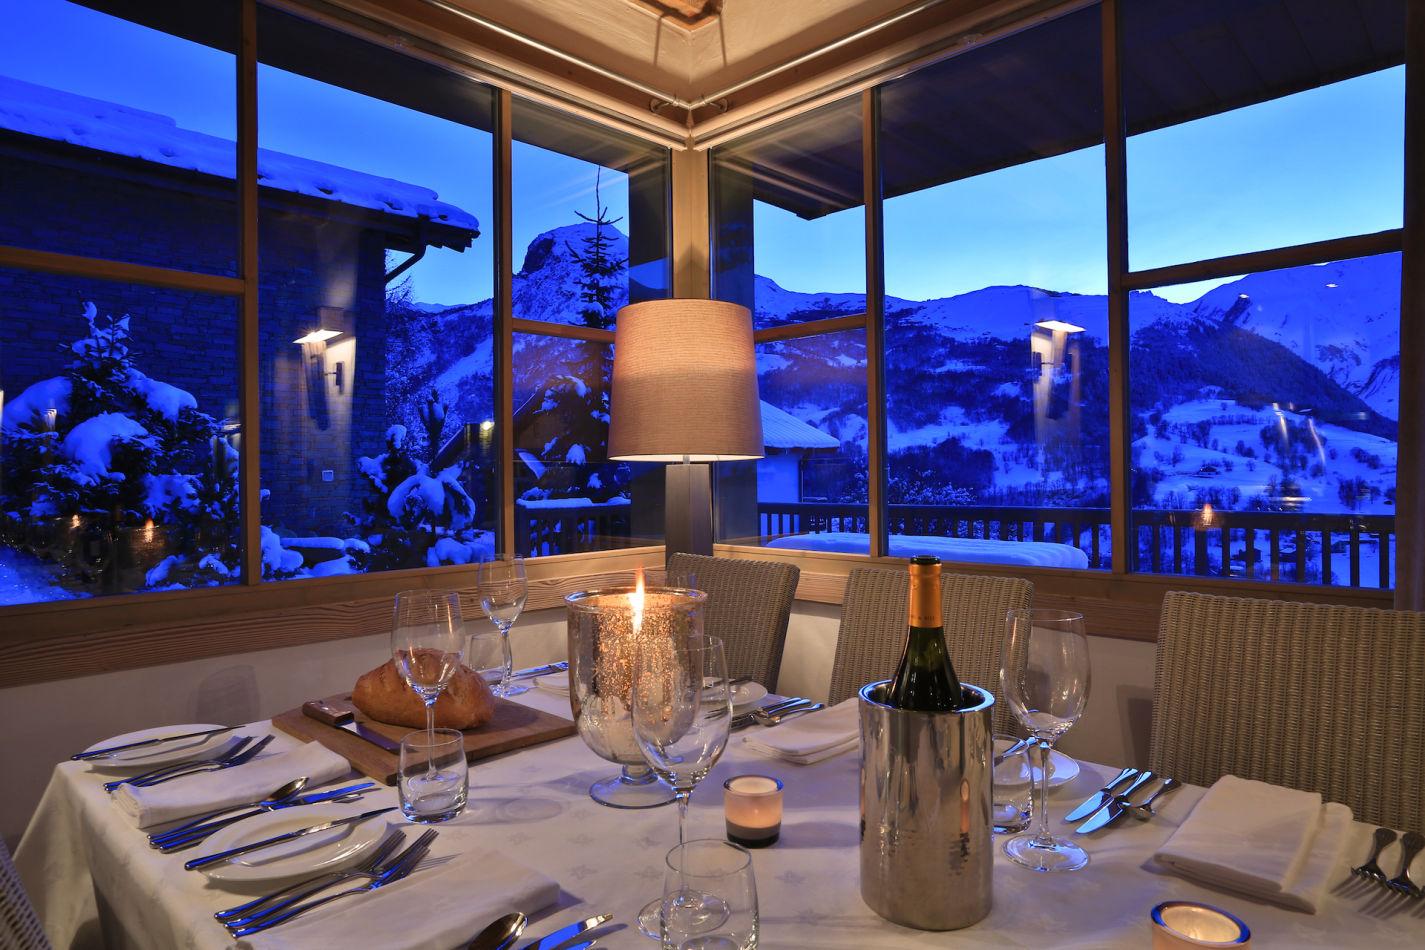 evening-dining-image-131